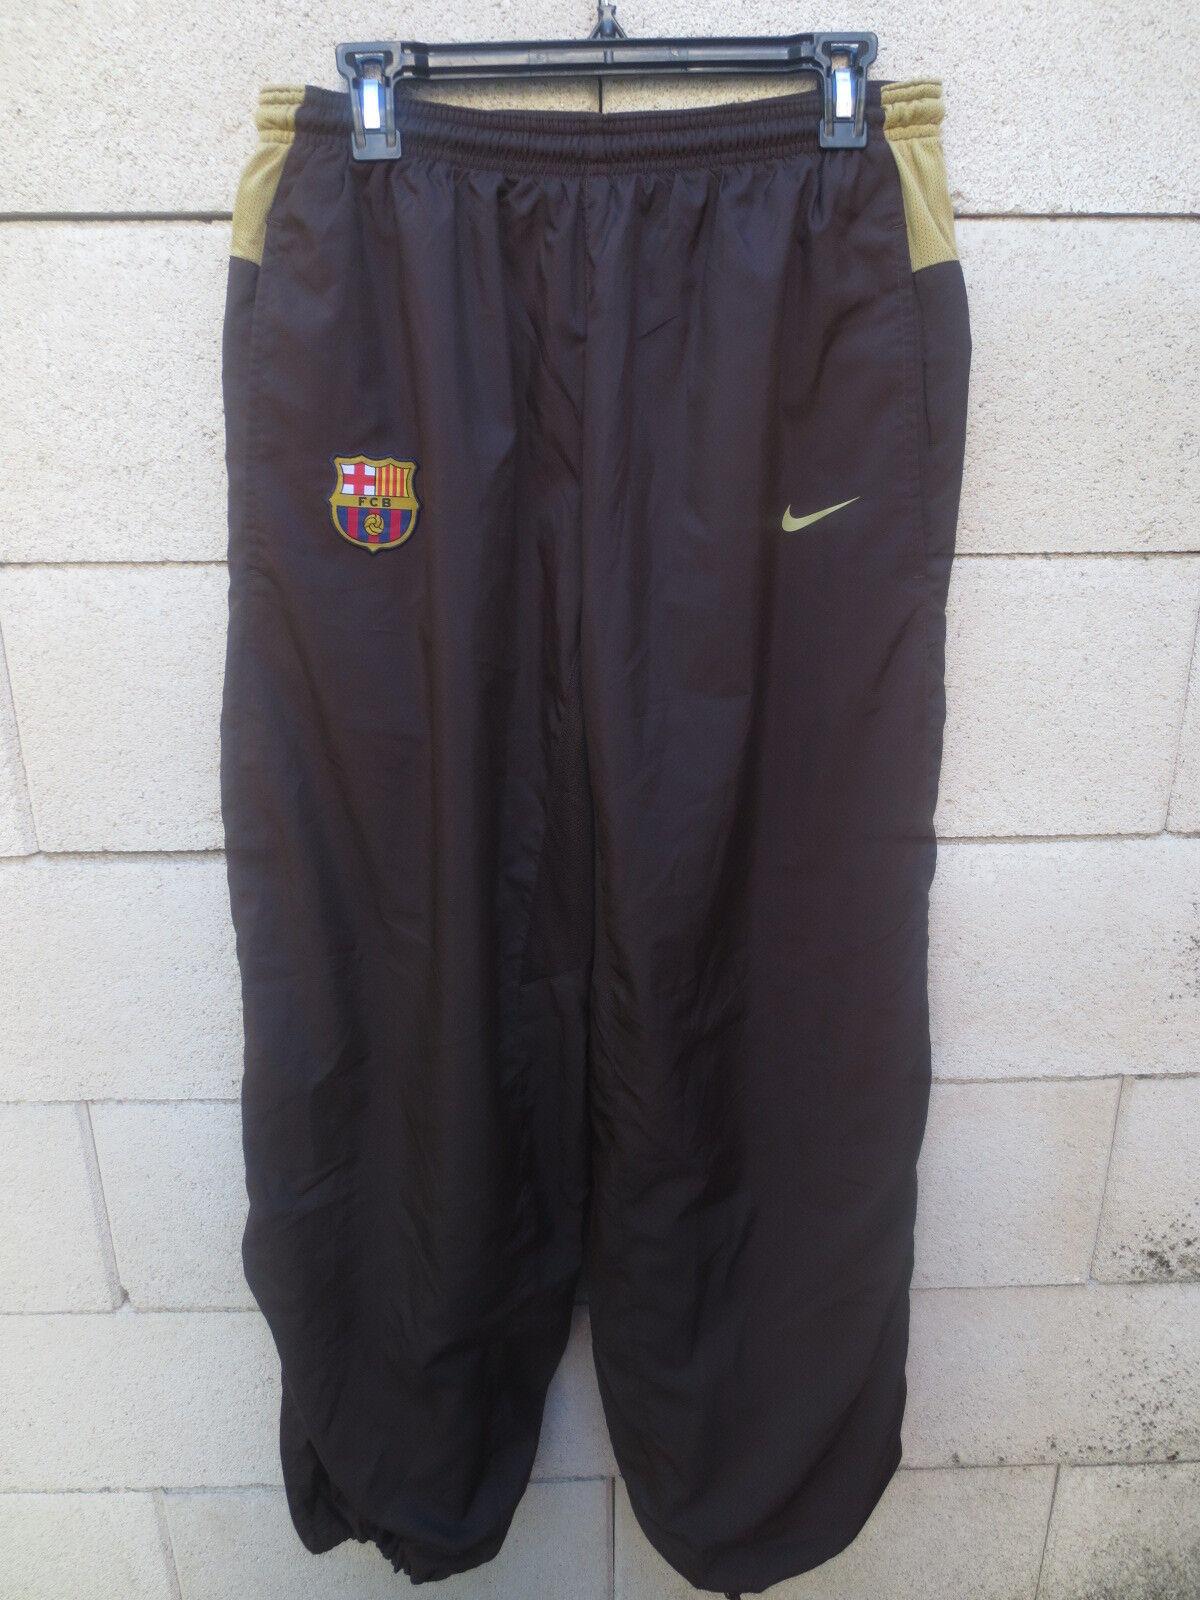 Pantalon F.C. BARCELONE BARCELONA NIKE pant brun fotbollsträning L